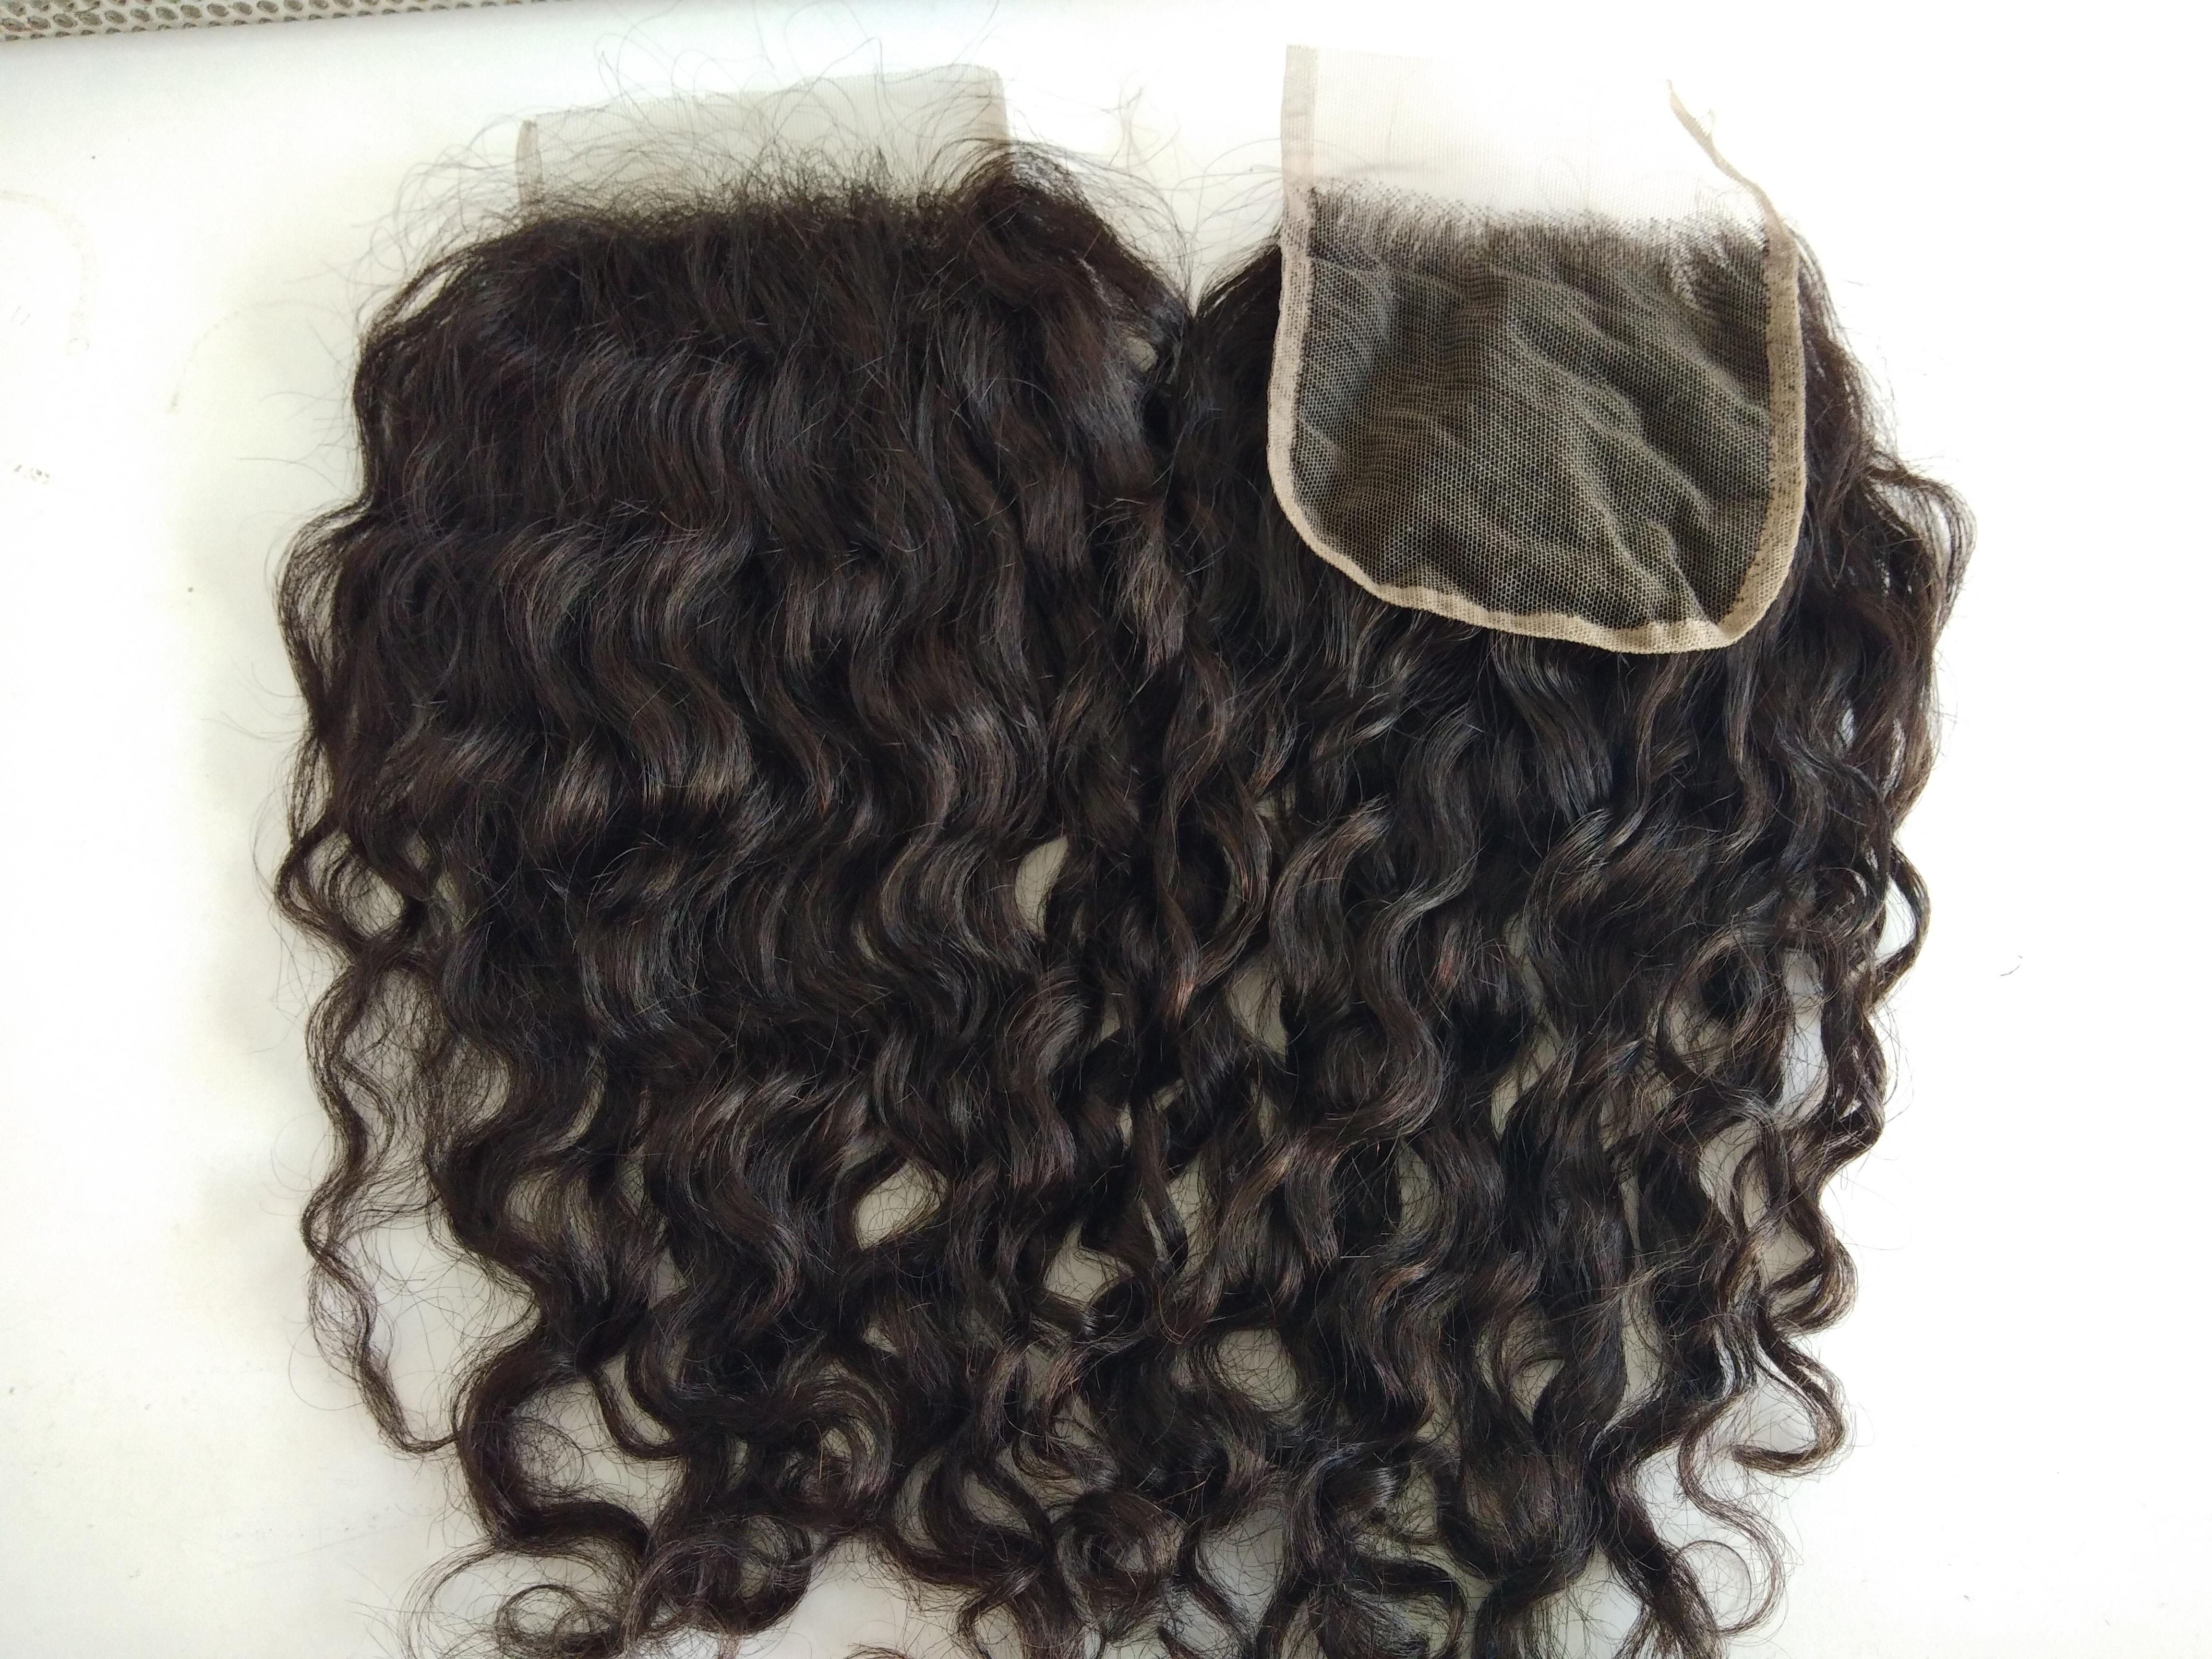 Brazilian Wholesale High Quality 4x4 Swiss Natural Wavy Lace Closure